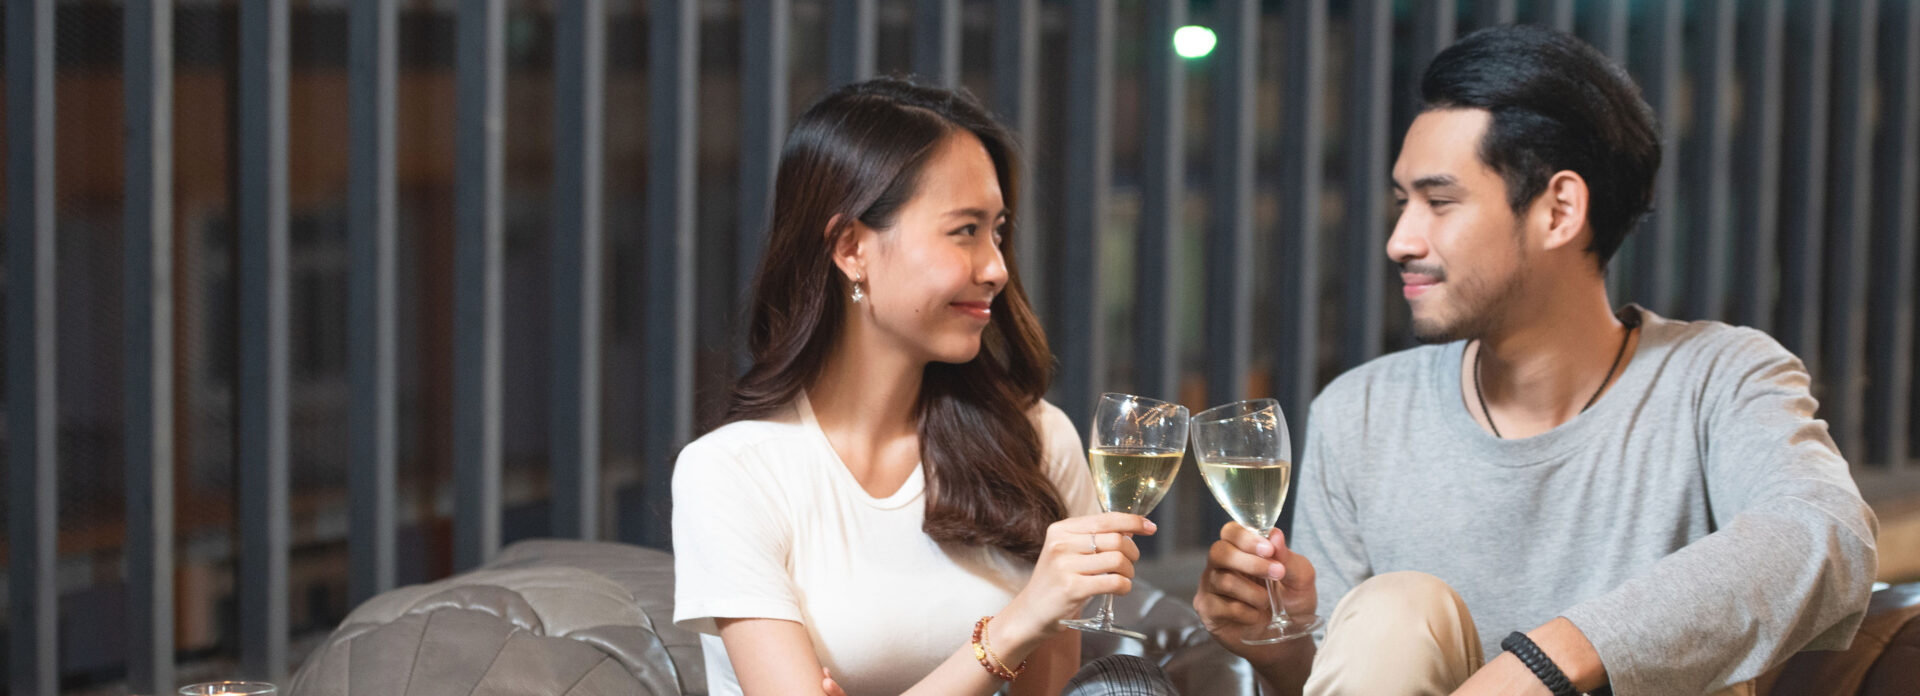 champagne Paris tips barer champagnebarer